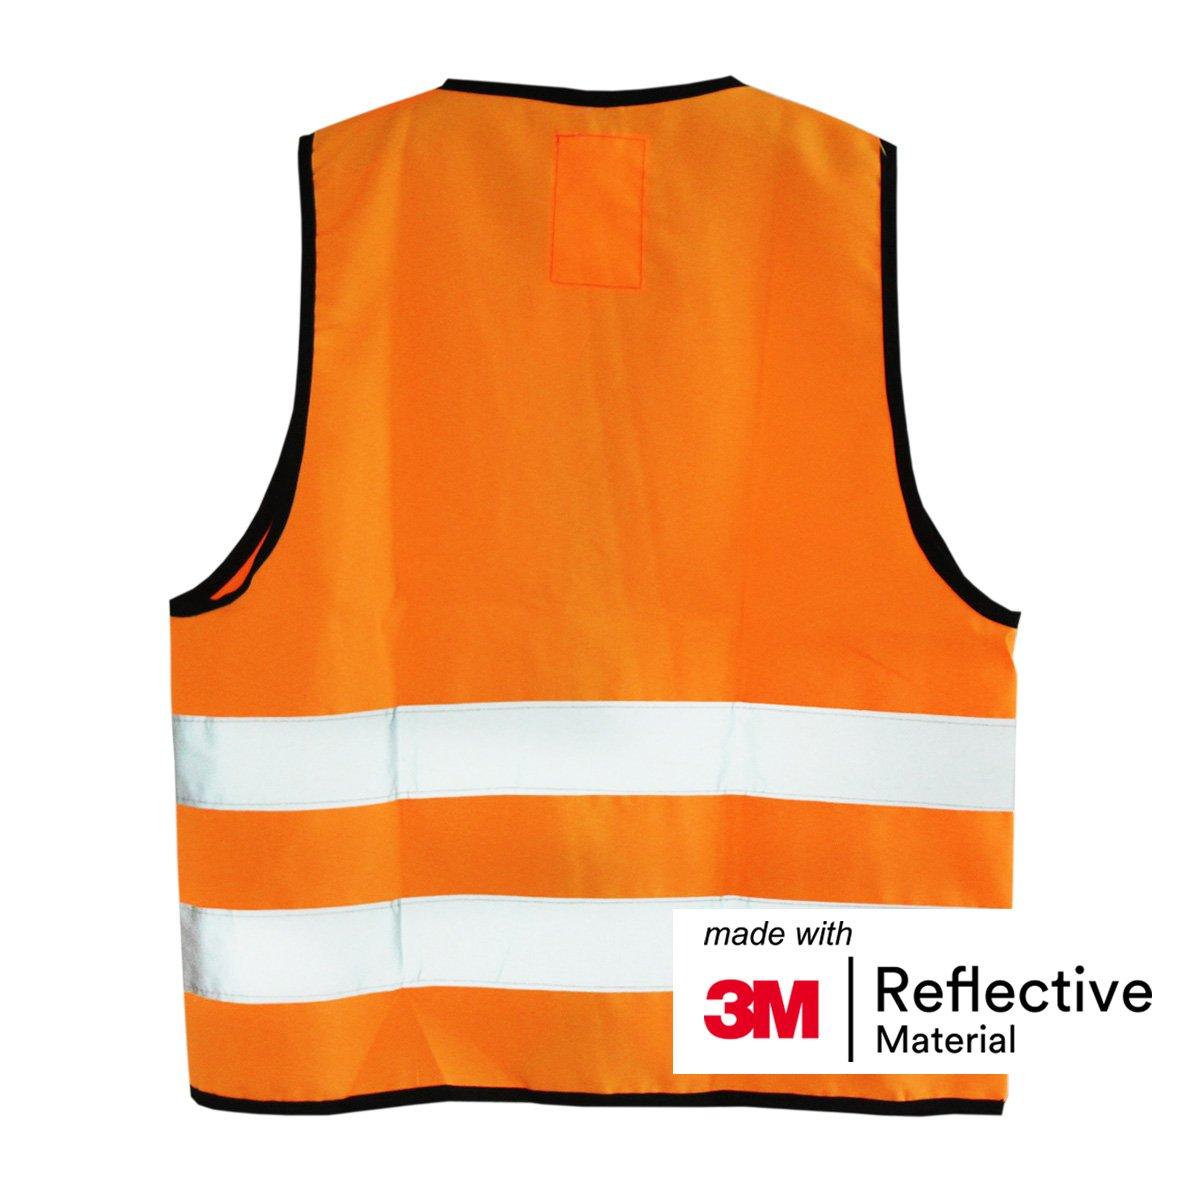 made with 3M Reflective Material Orange M Salzmann 3M Childrens Safety Vest